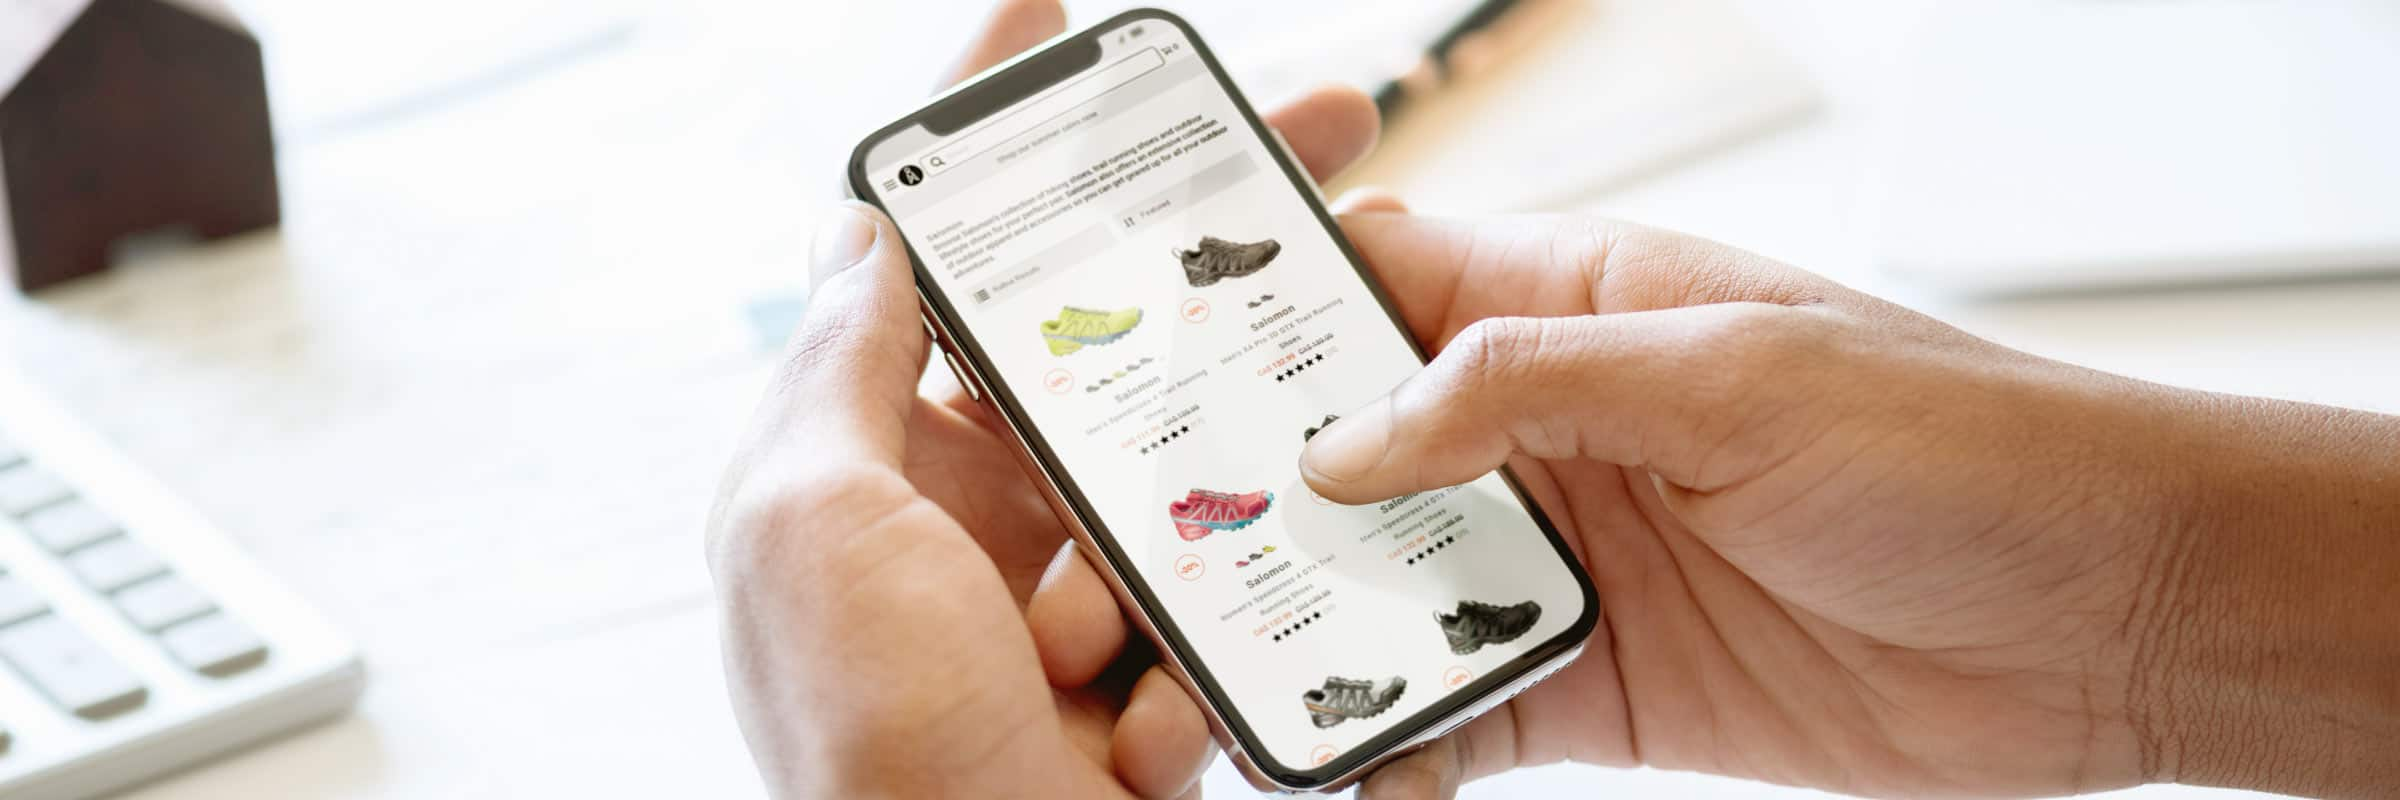 Running, Salomon. Salomon Deals & Discounts for March 2019